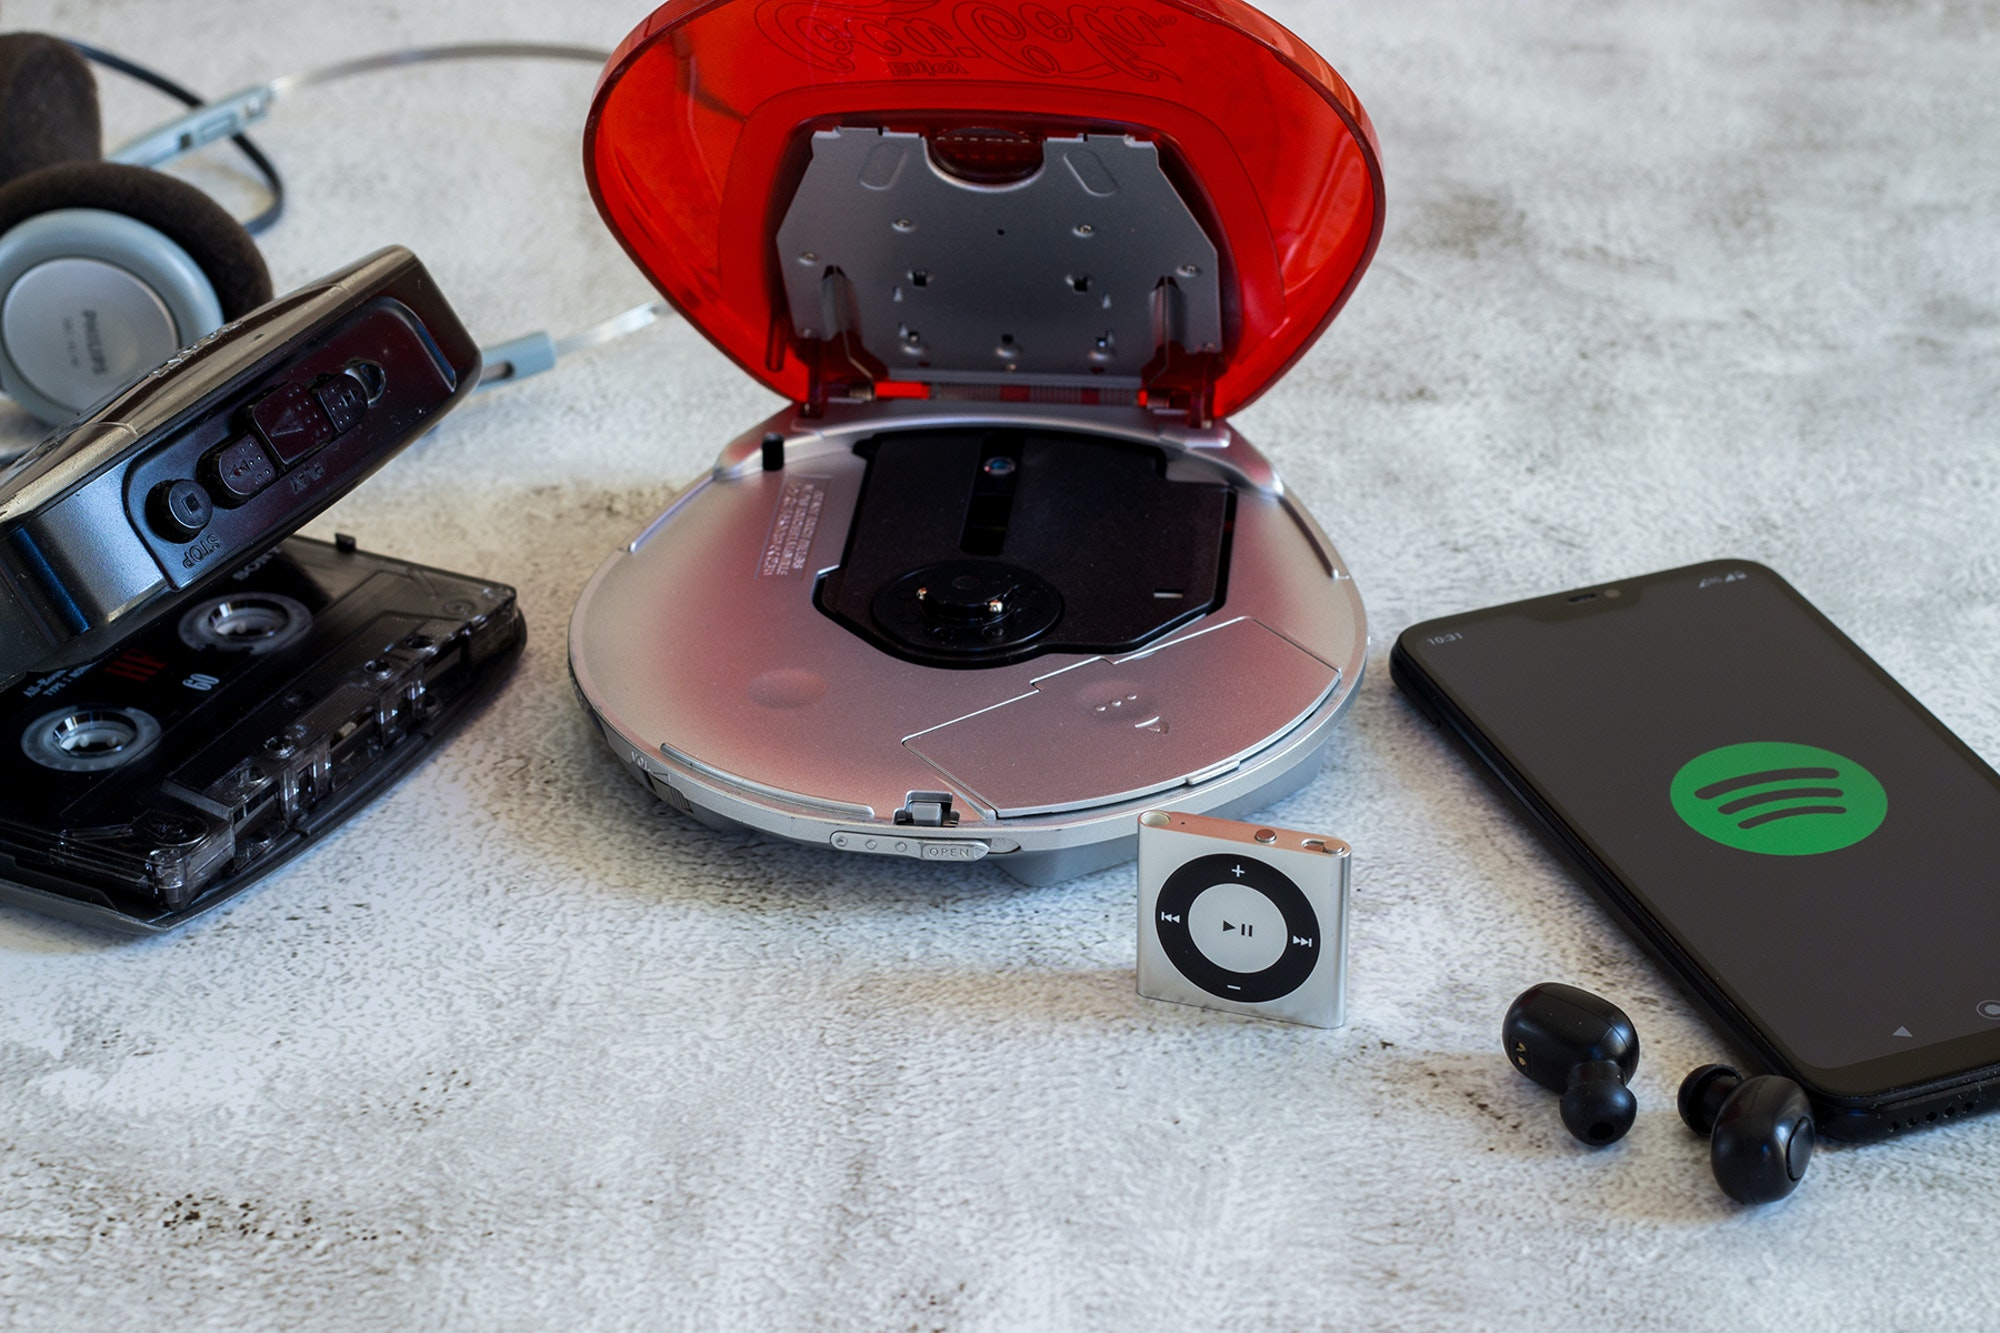 Analog-digital-Walkman CD player Ipod phone true wireless earphones